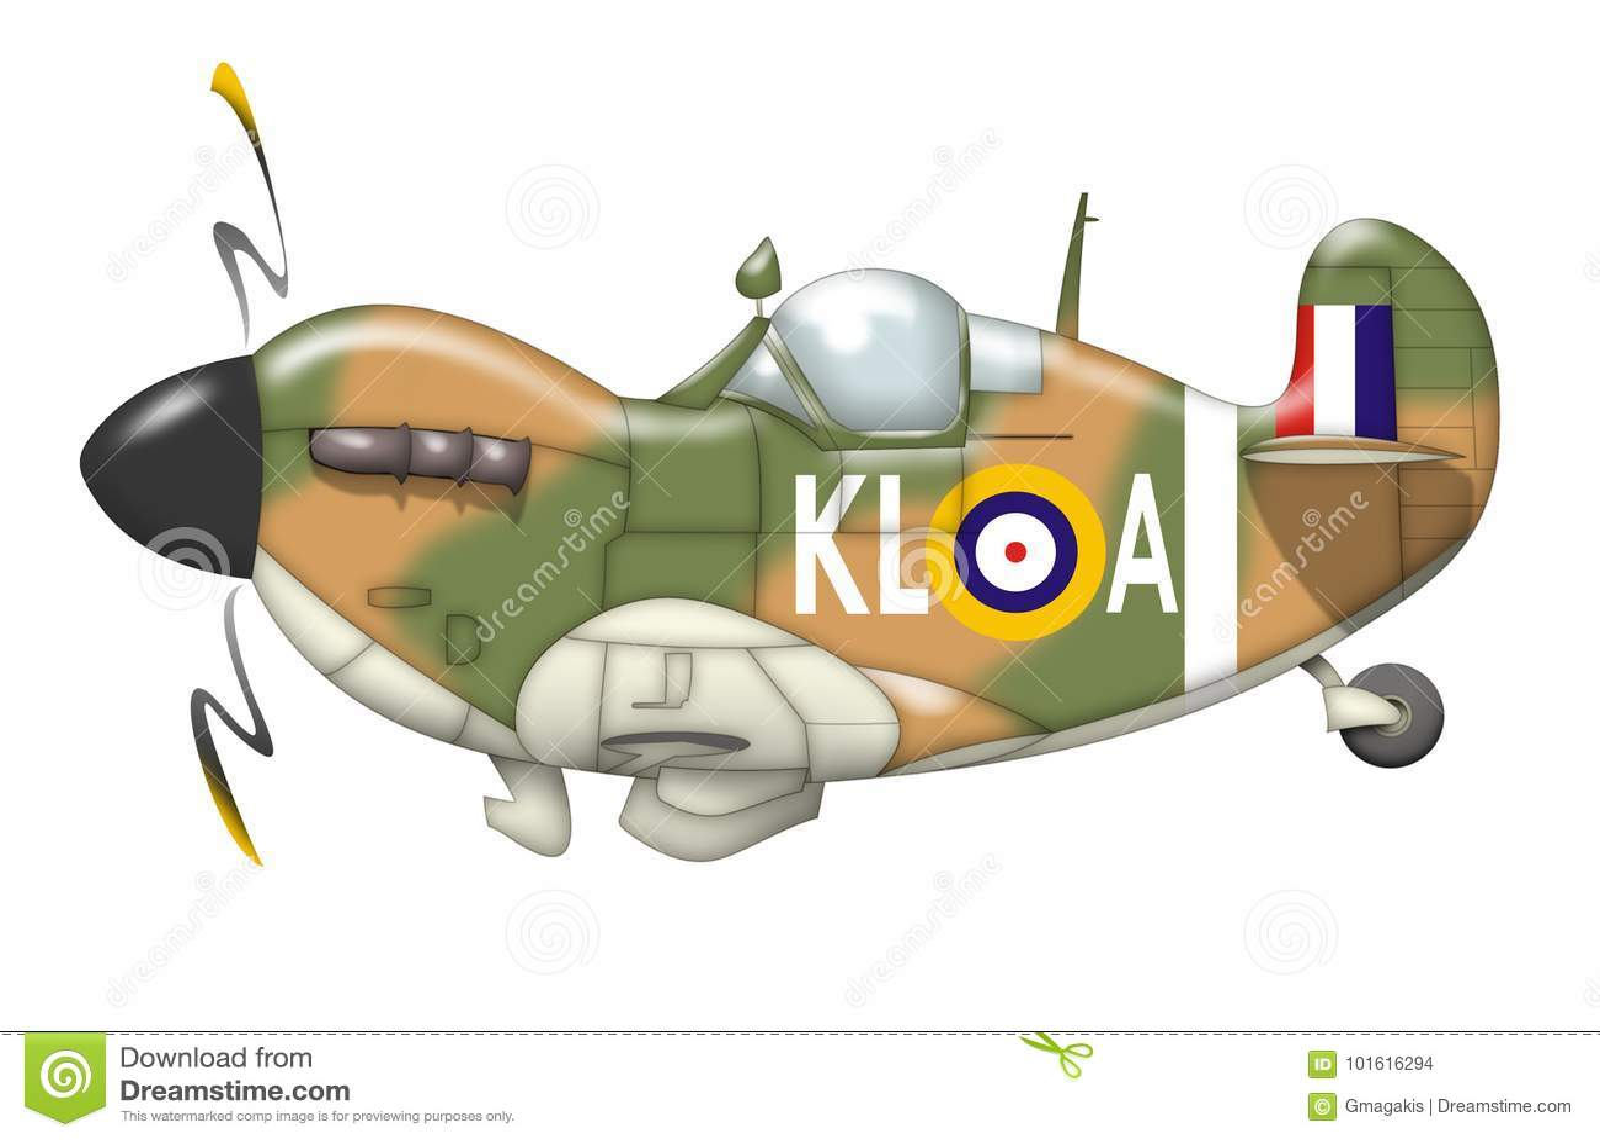 Cartoon Plane Caricature Stock Illustration. Image Of